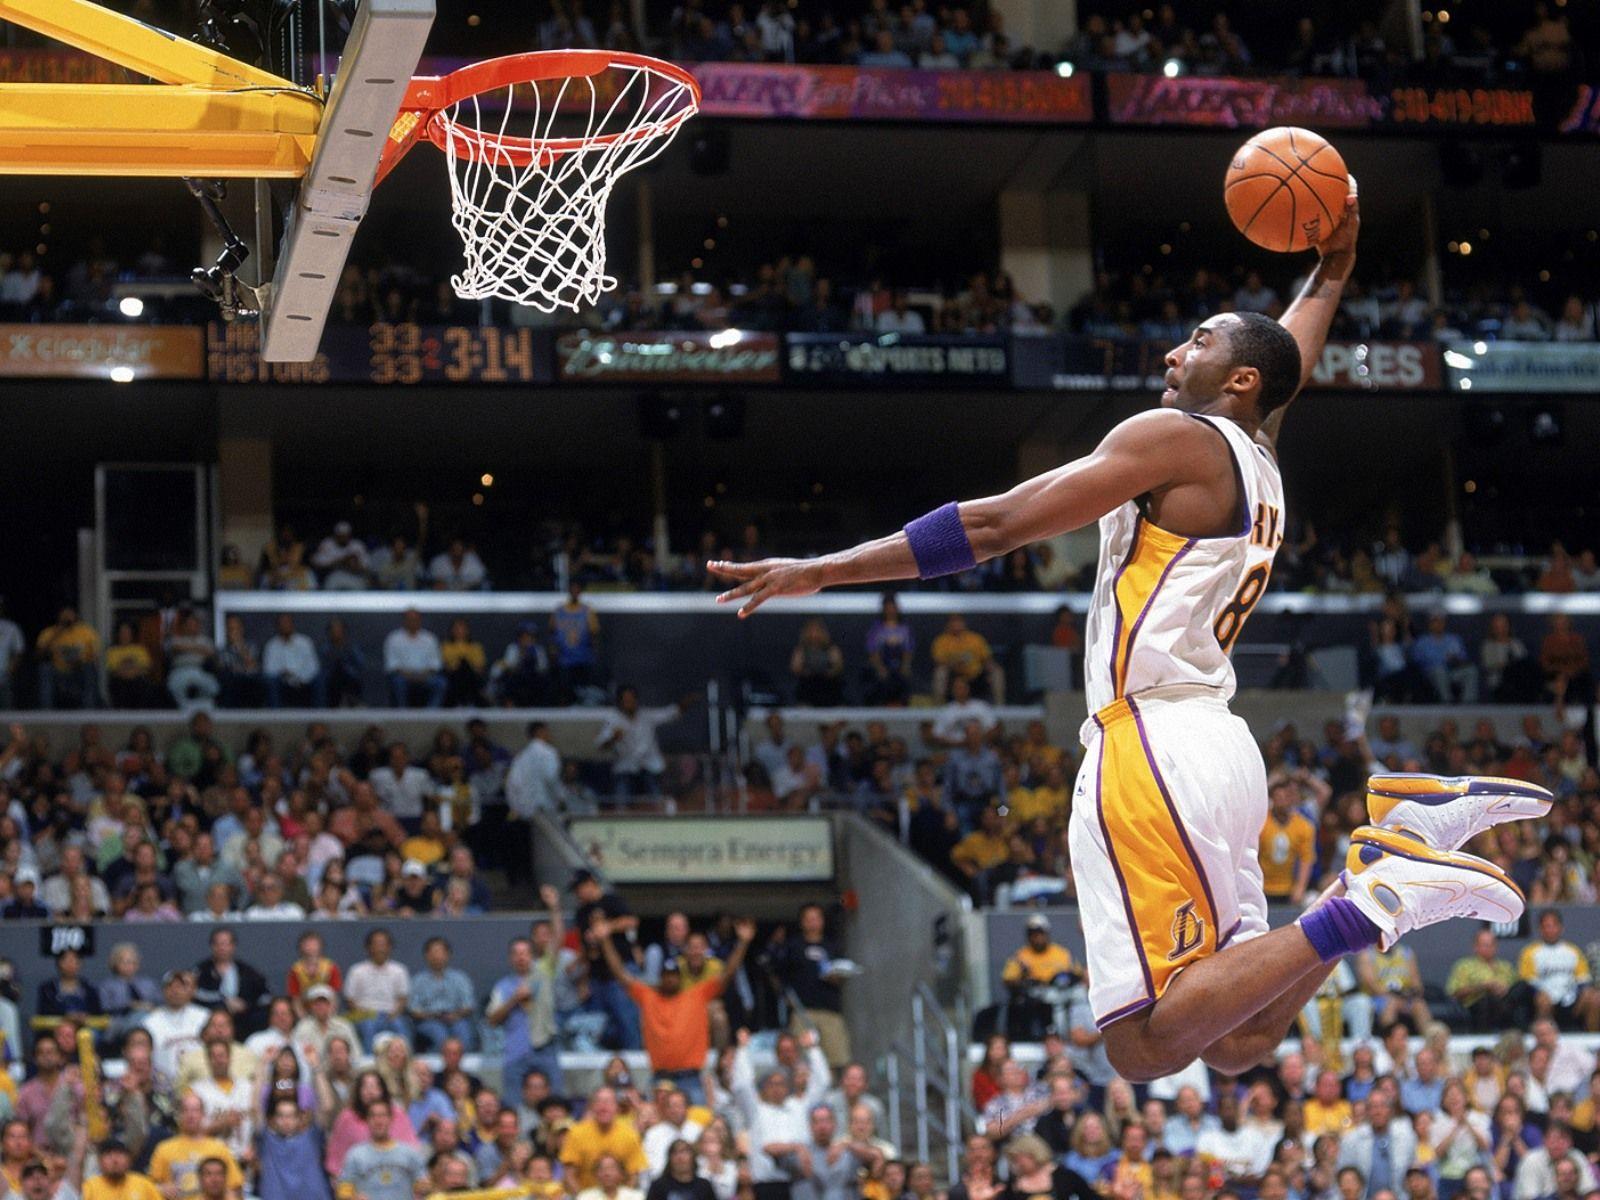 Прогнозы на спорт на баскетбол